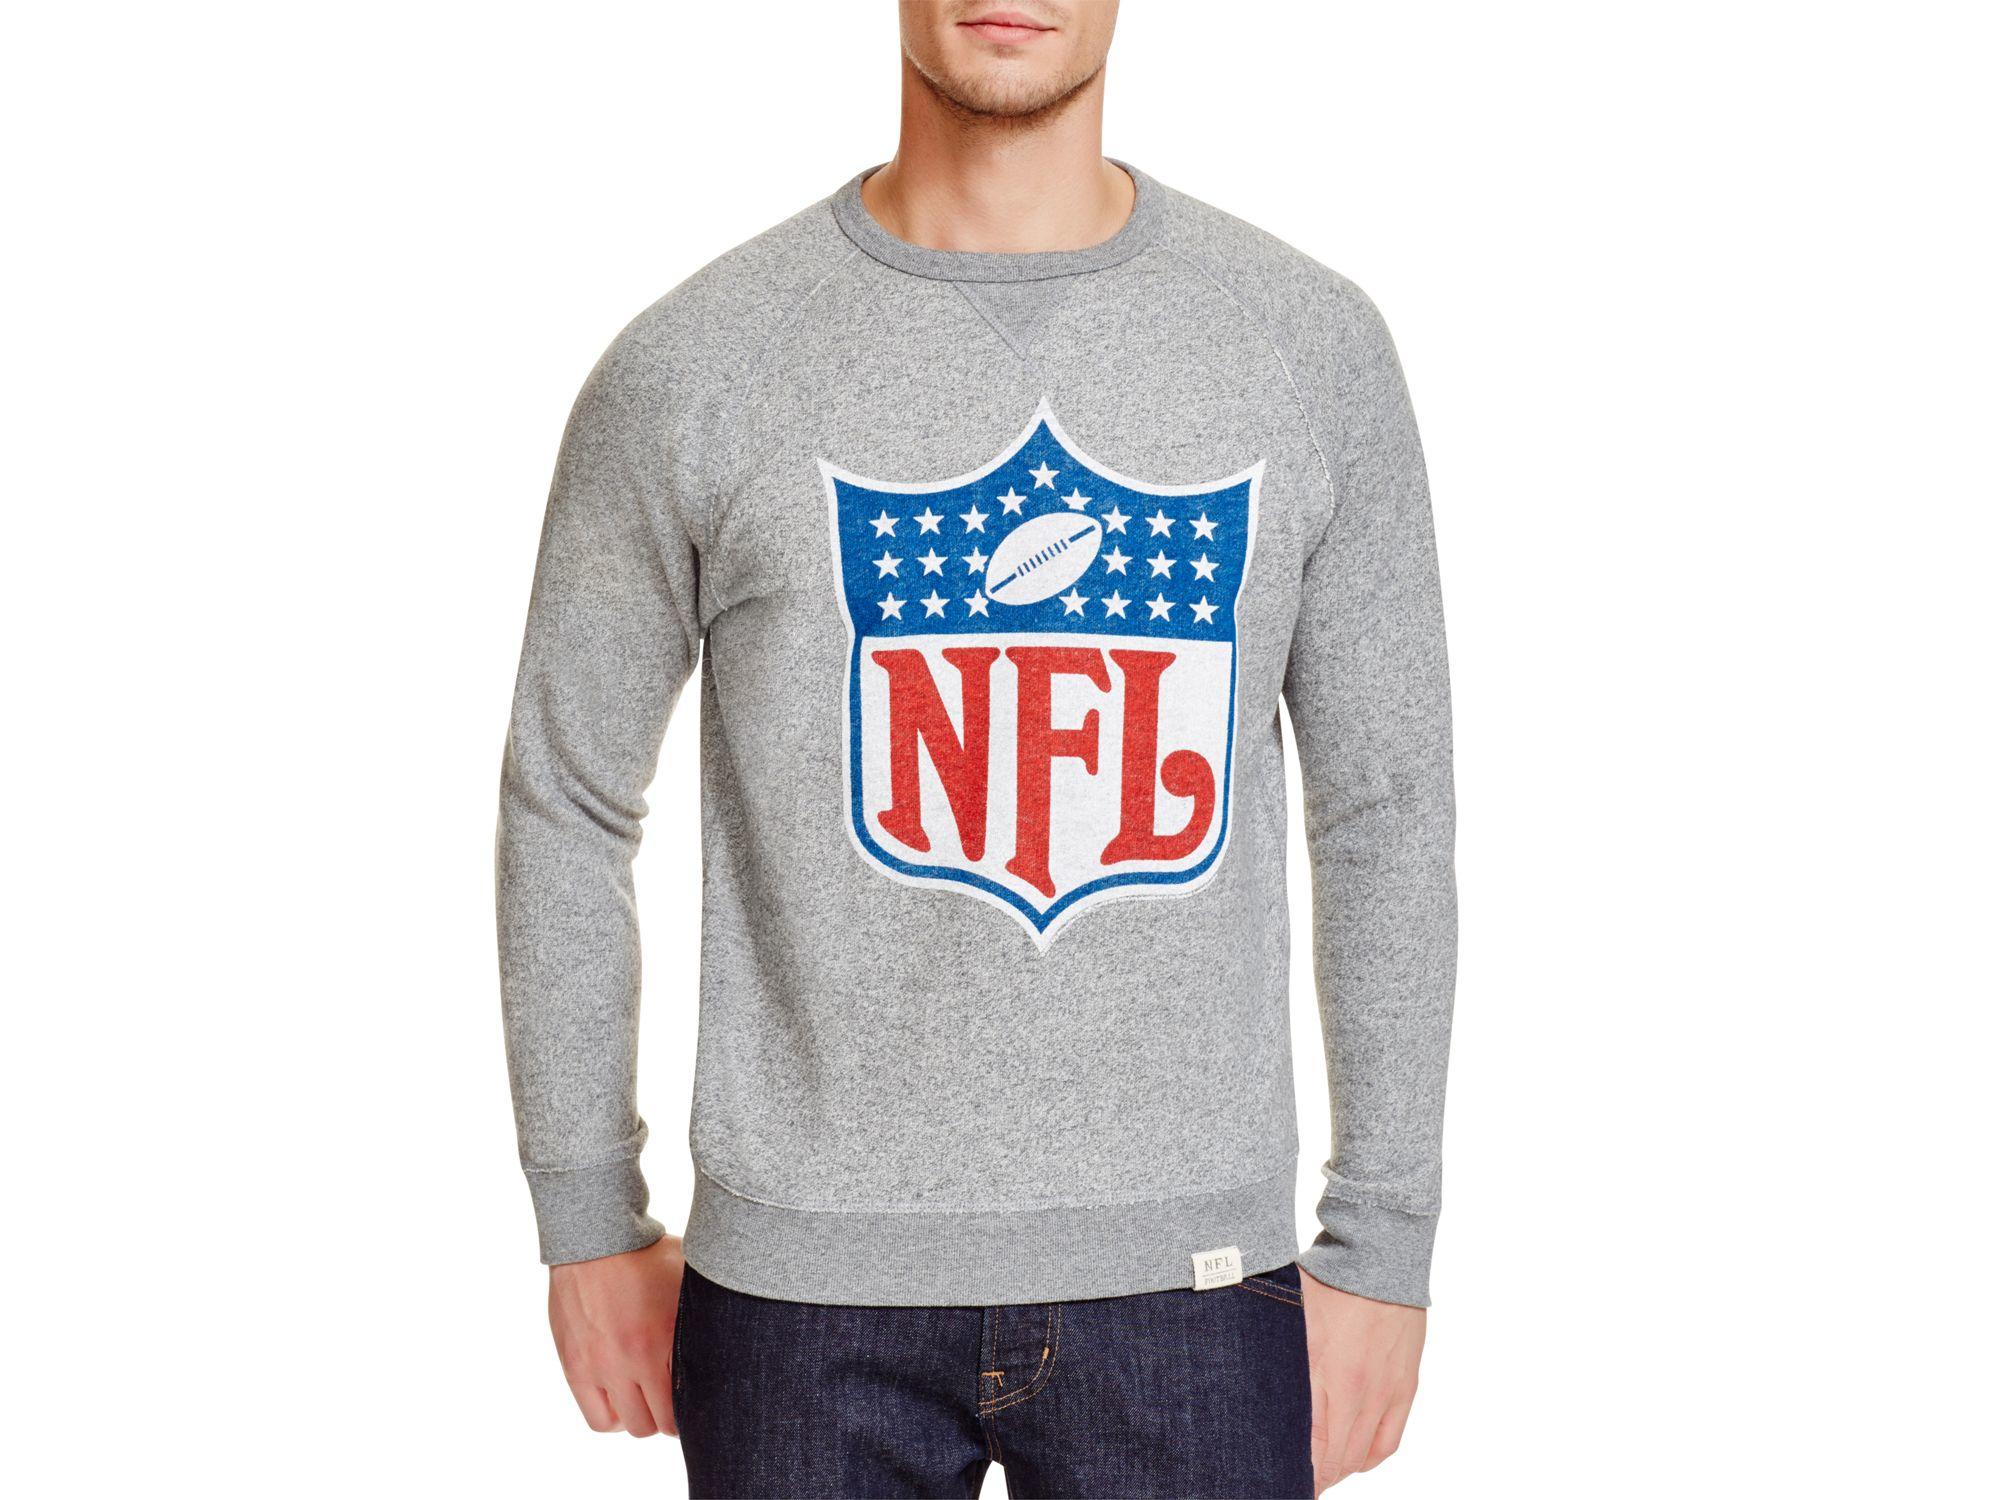 15e512c14 Lyst - Junk Food Nfl Logo Sweatshirt in Gray for Men